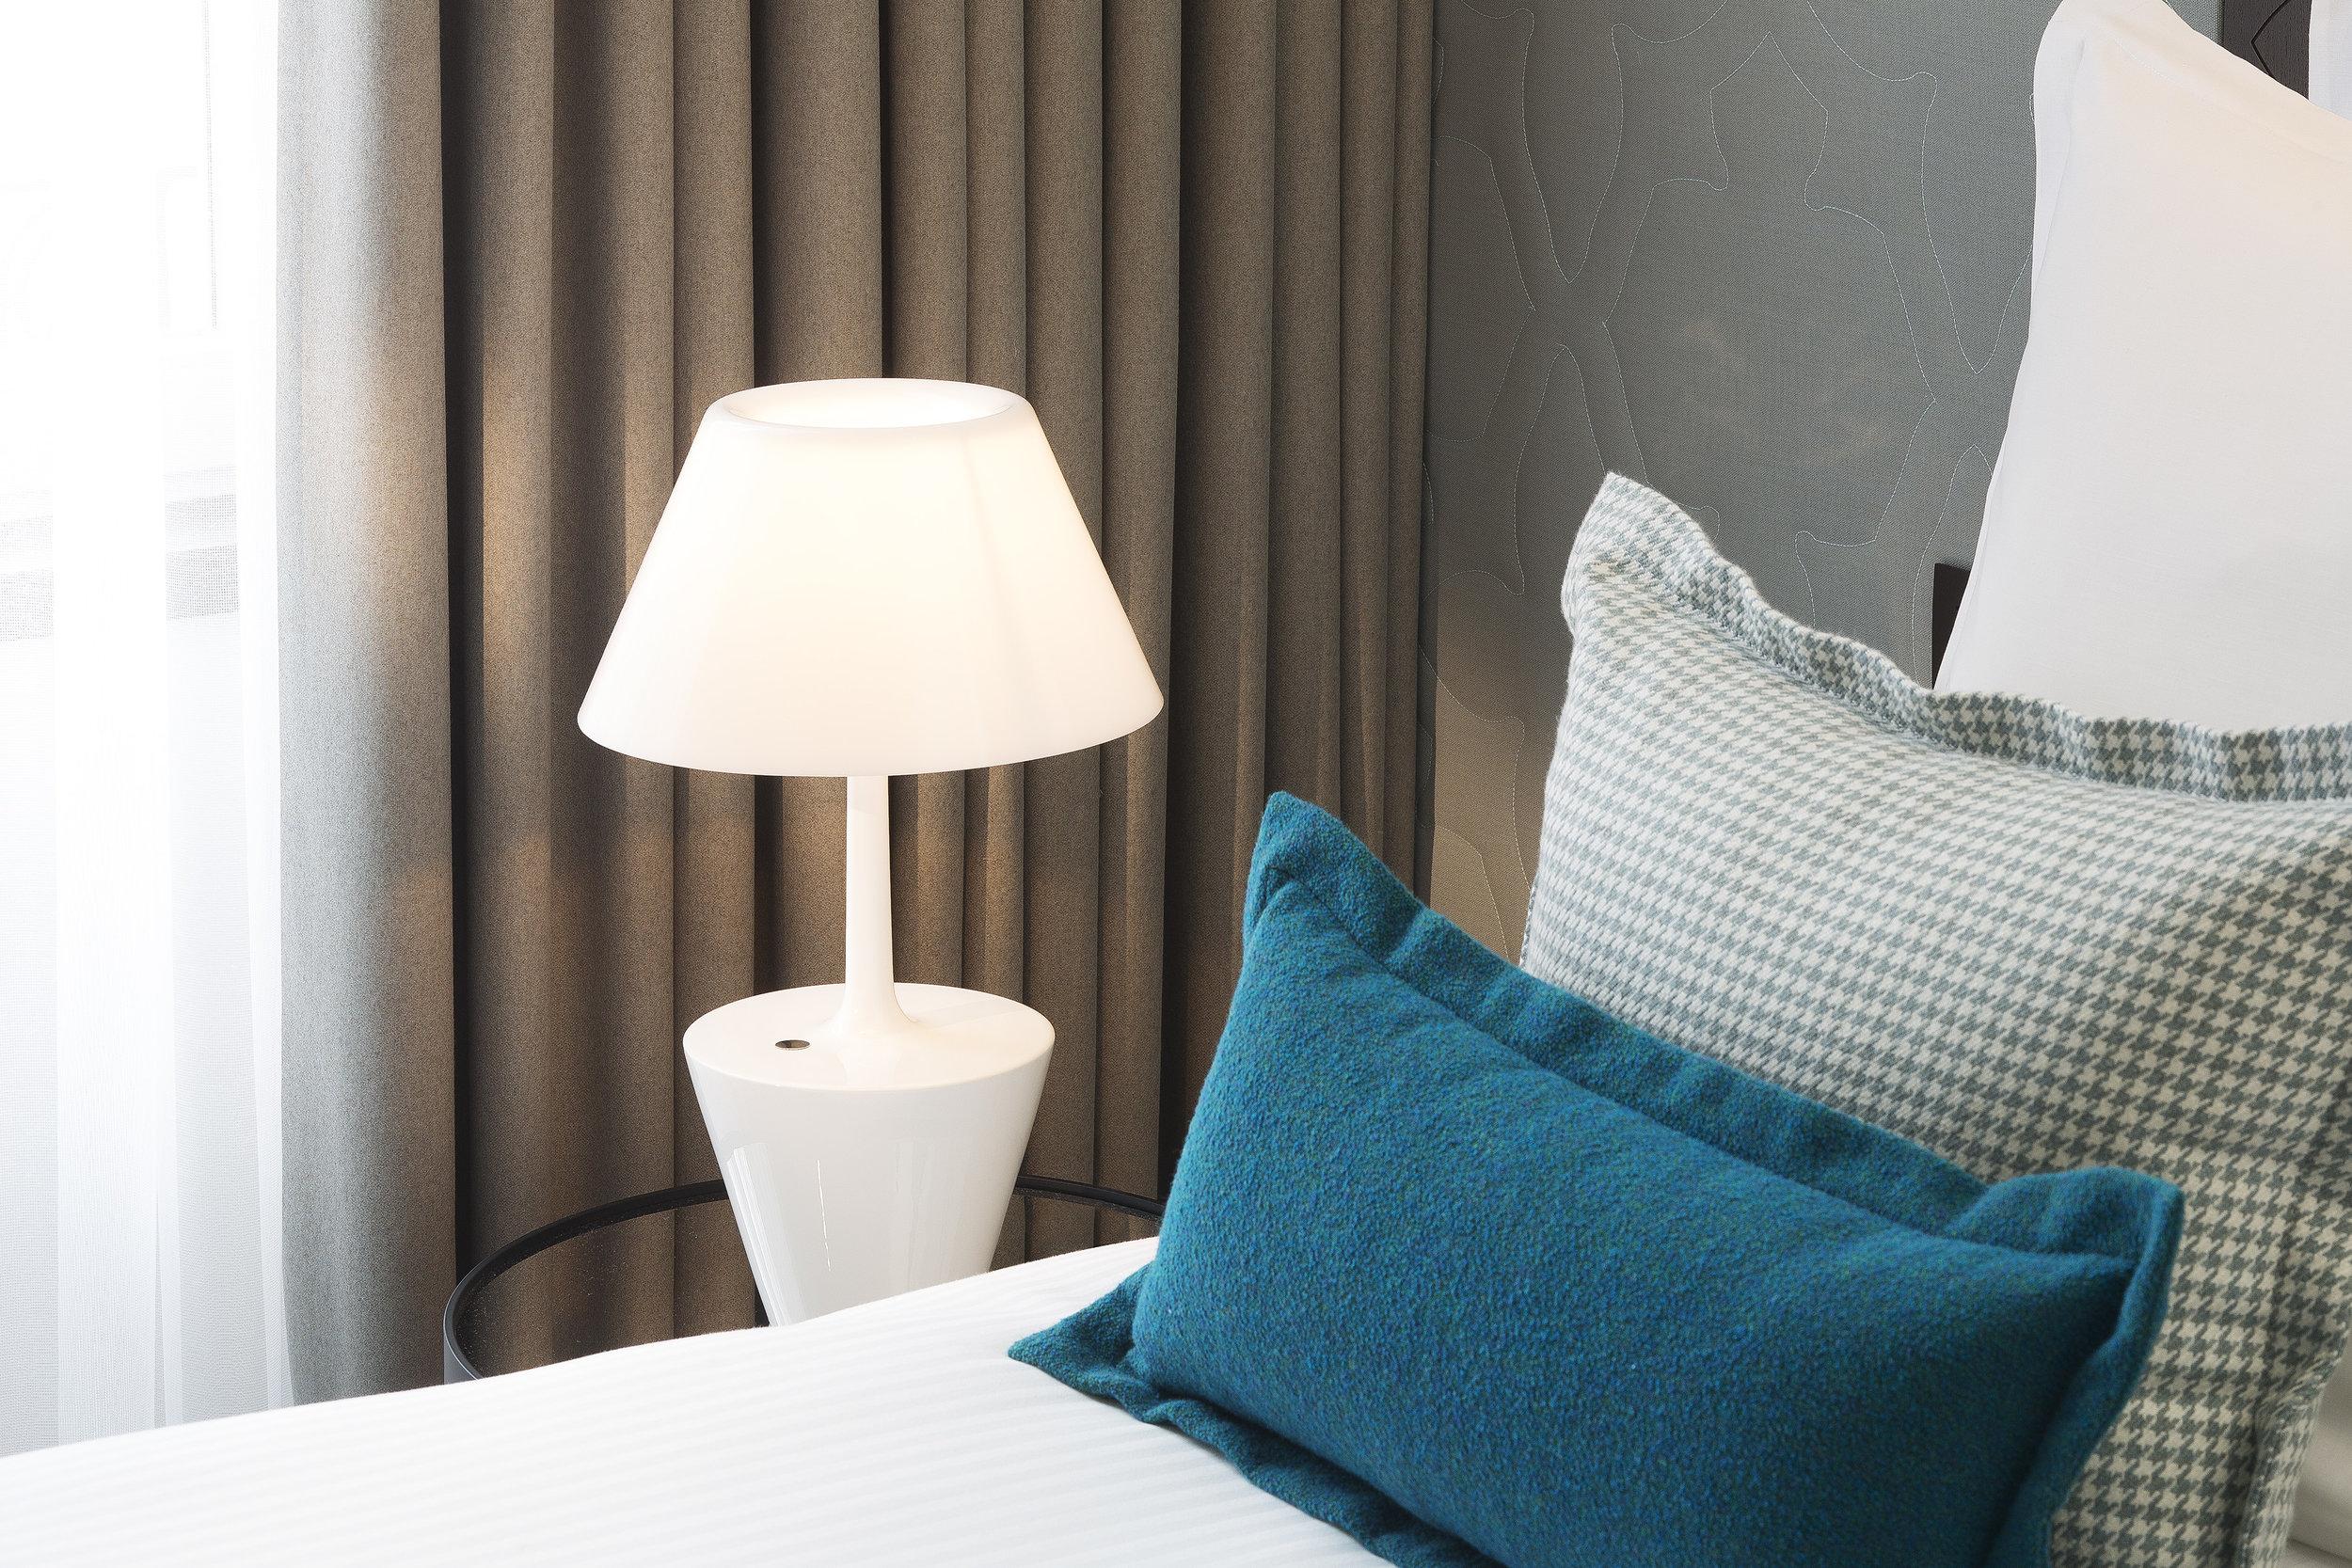 hotel-d-strasbourg-photo-christophe bielsa-chambre-standard-27 md.jpg